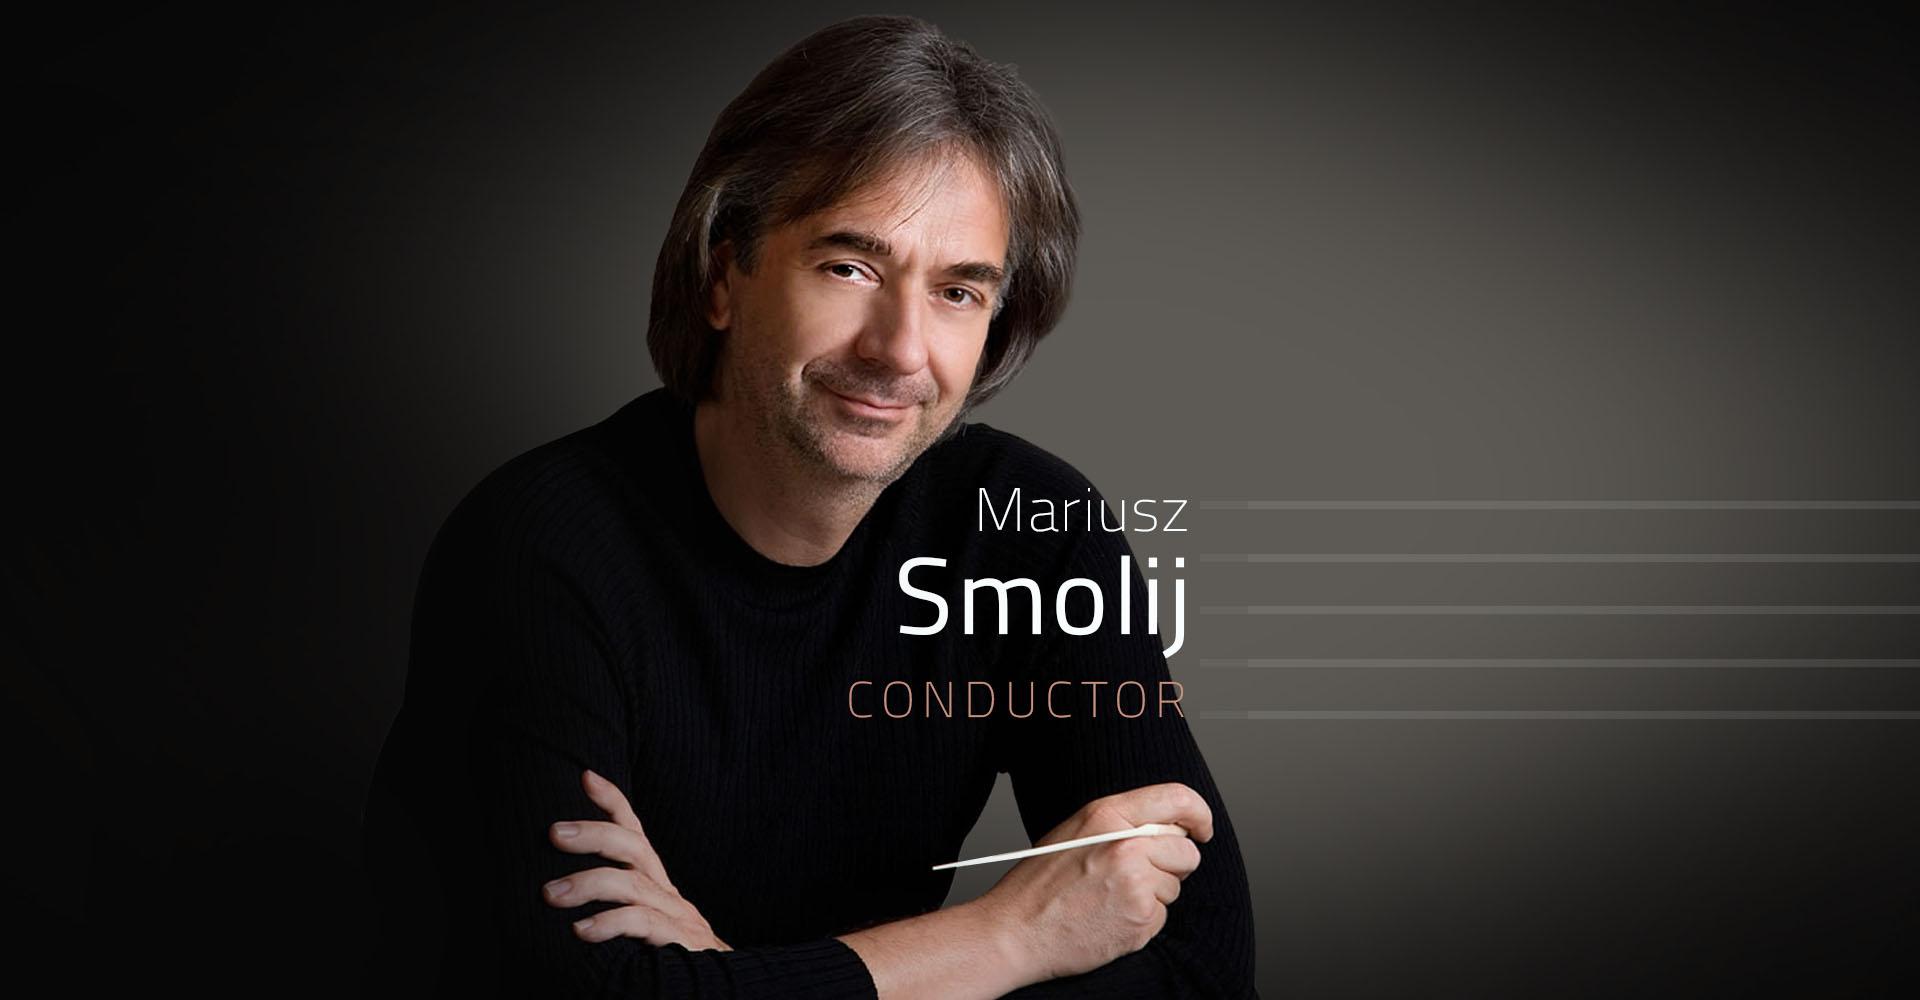 Mariusz_Smolij_slider_mobile_1_v2